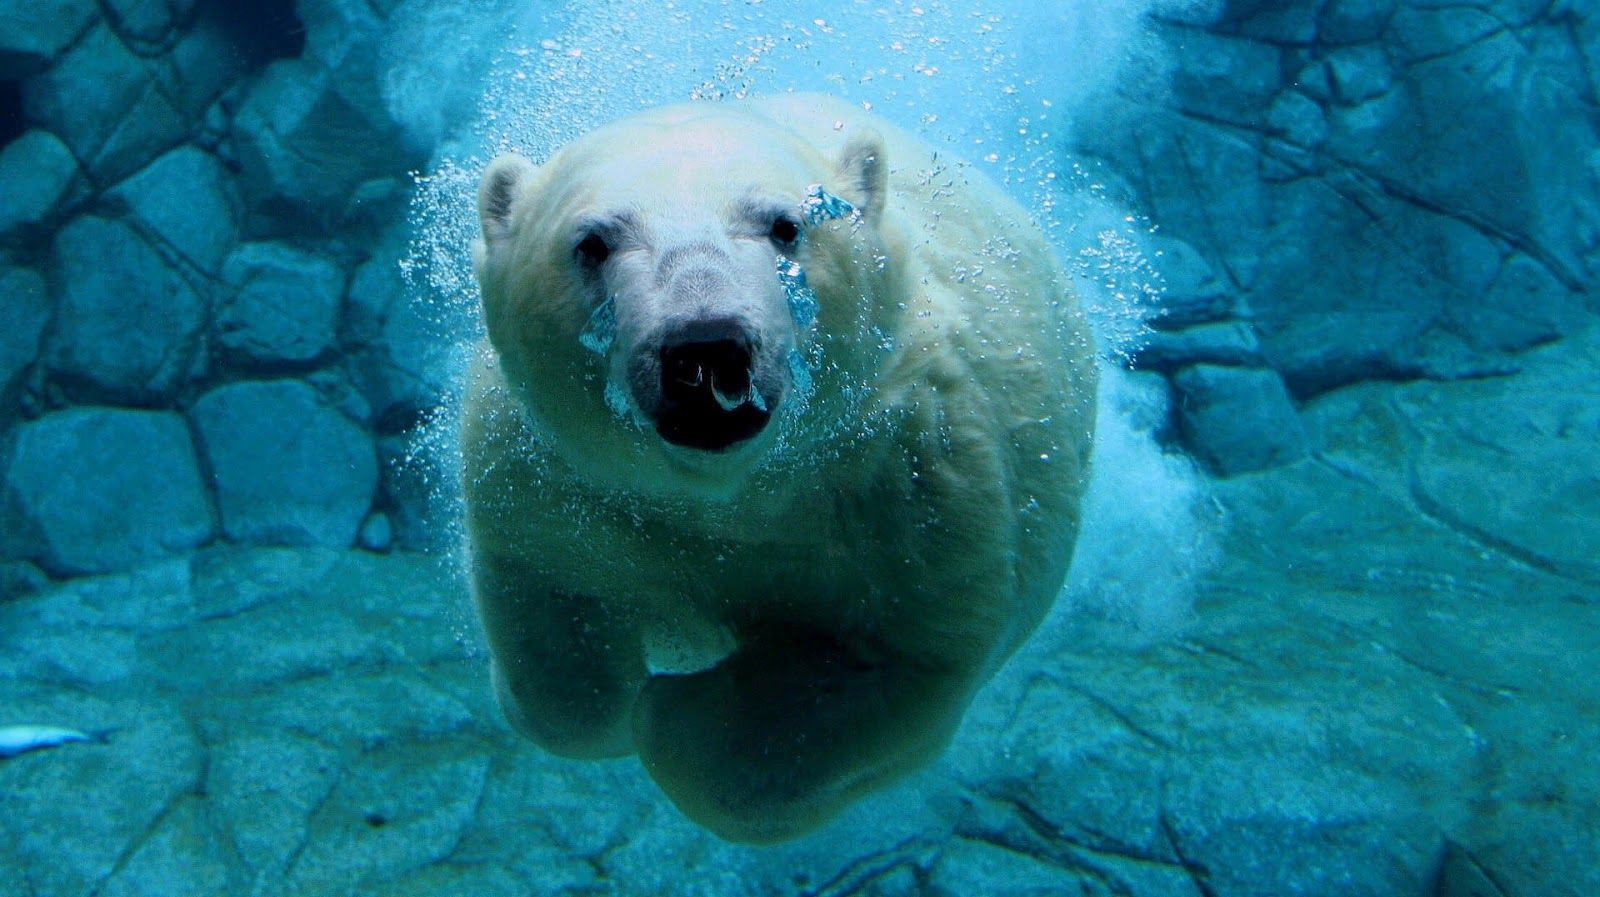 underwater animals | hd animal wallpaper with a polar bear swimming